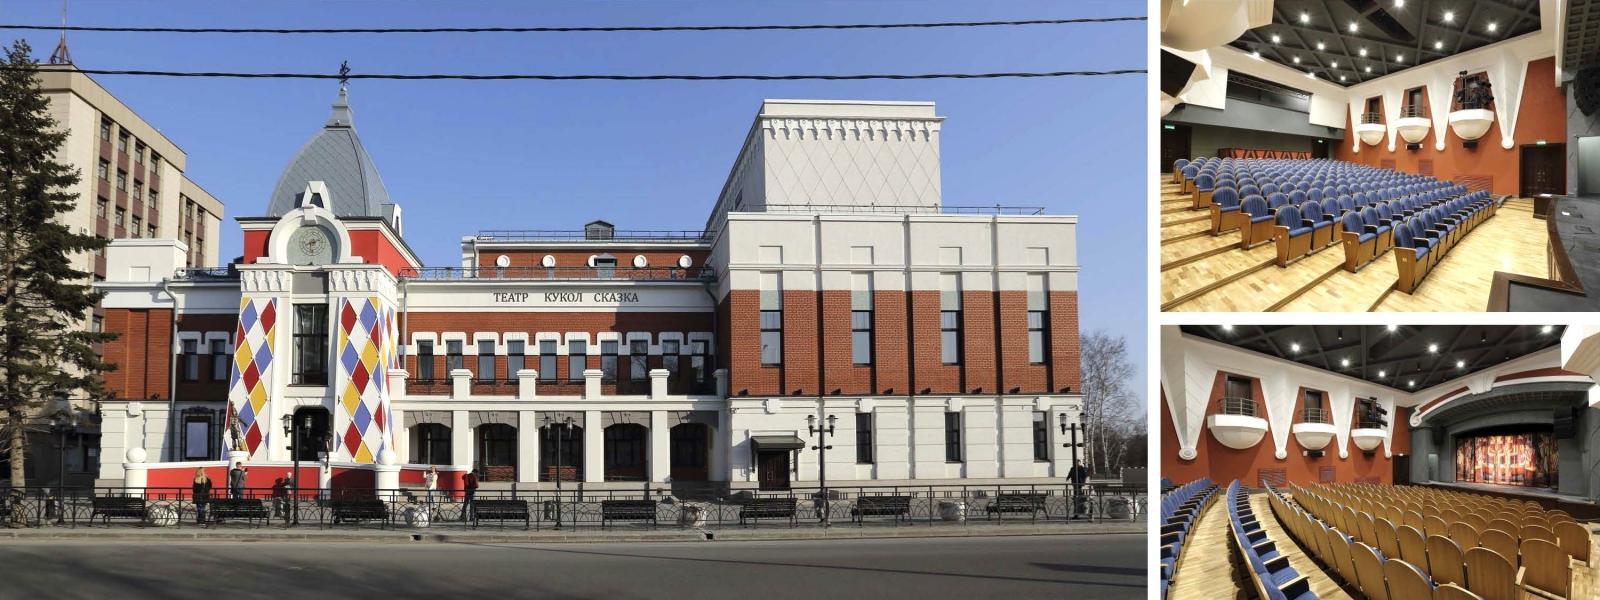 work-Театр кукол «Сказка» в Барнауле